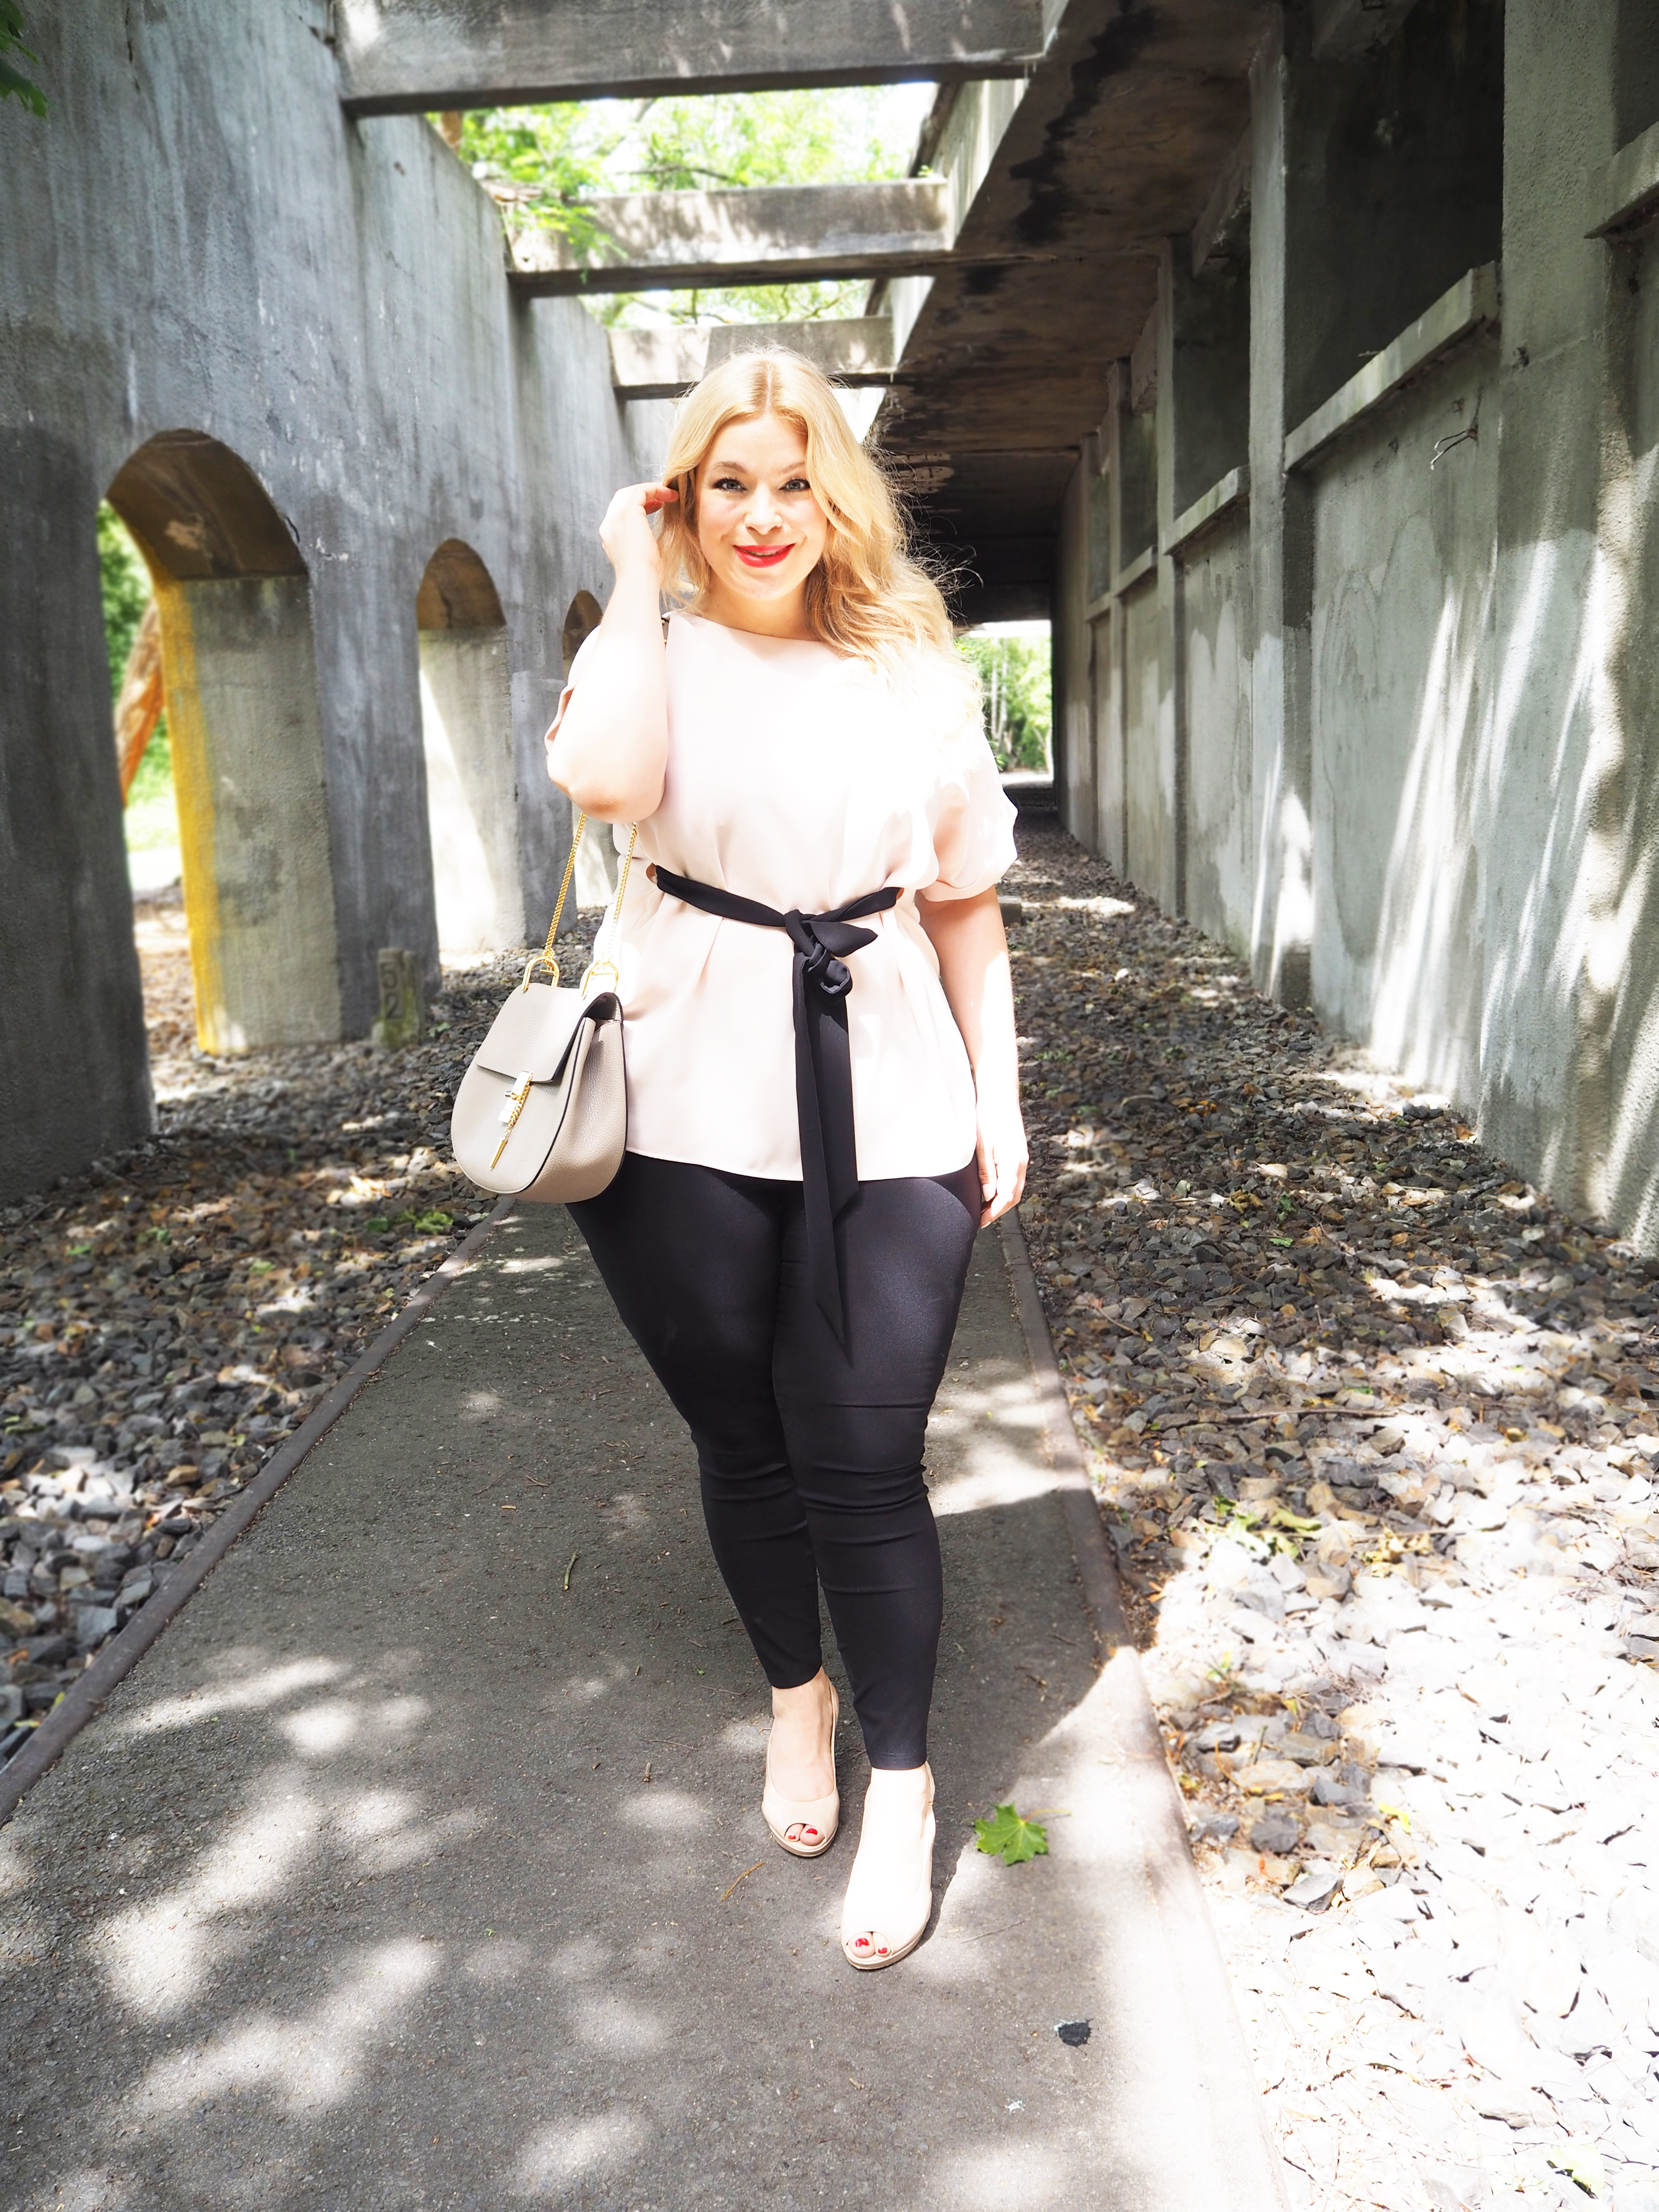 Caterina-pogorzelski-Megabambi-plussizeblogger